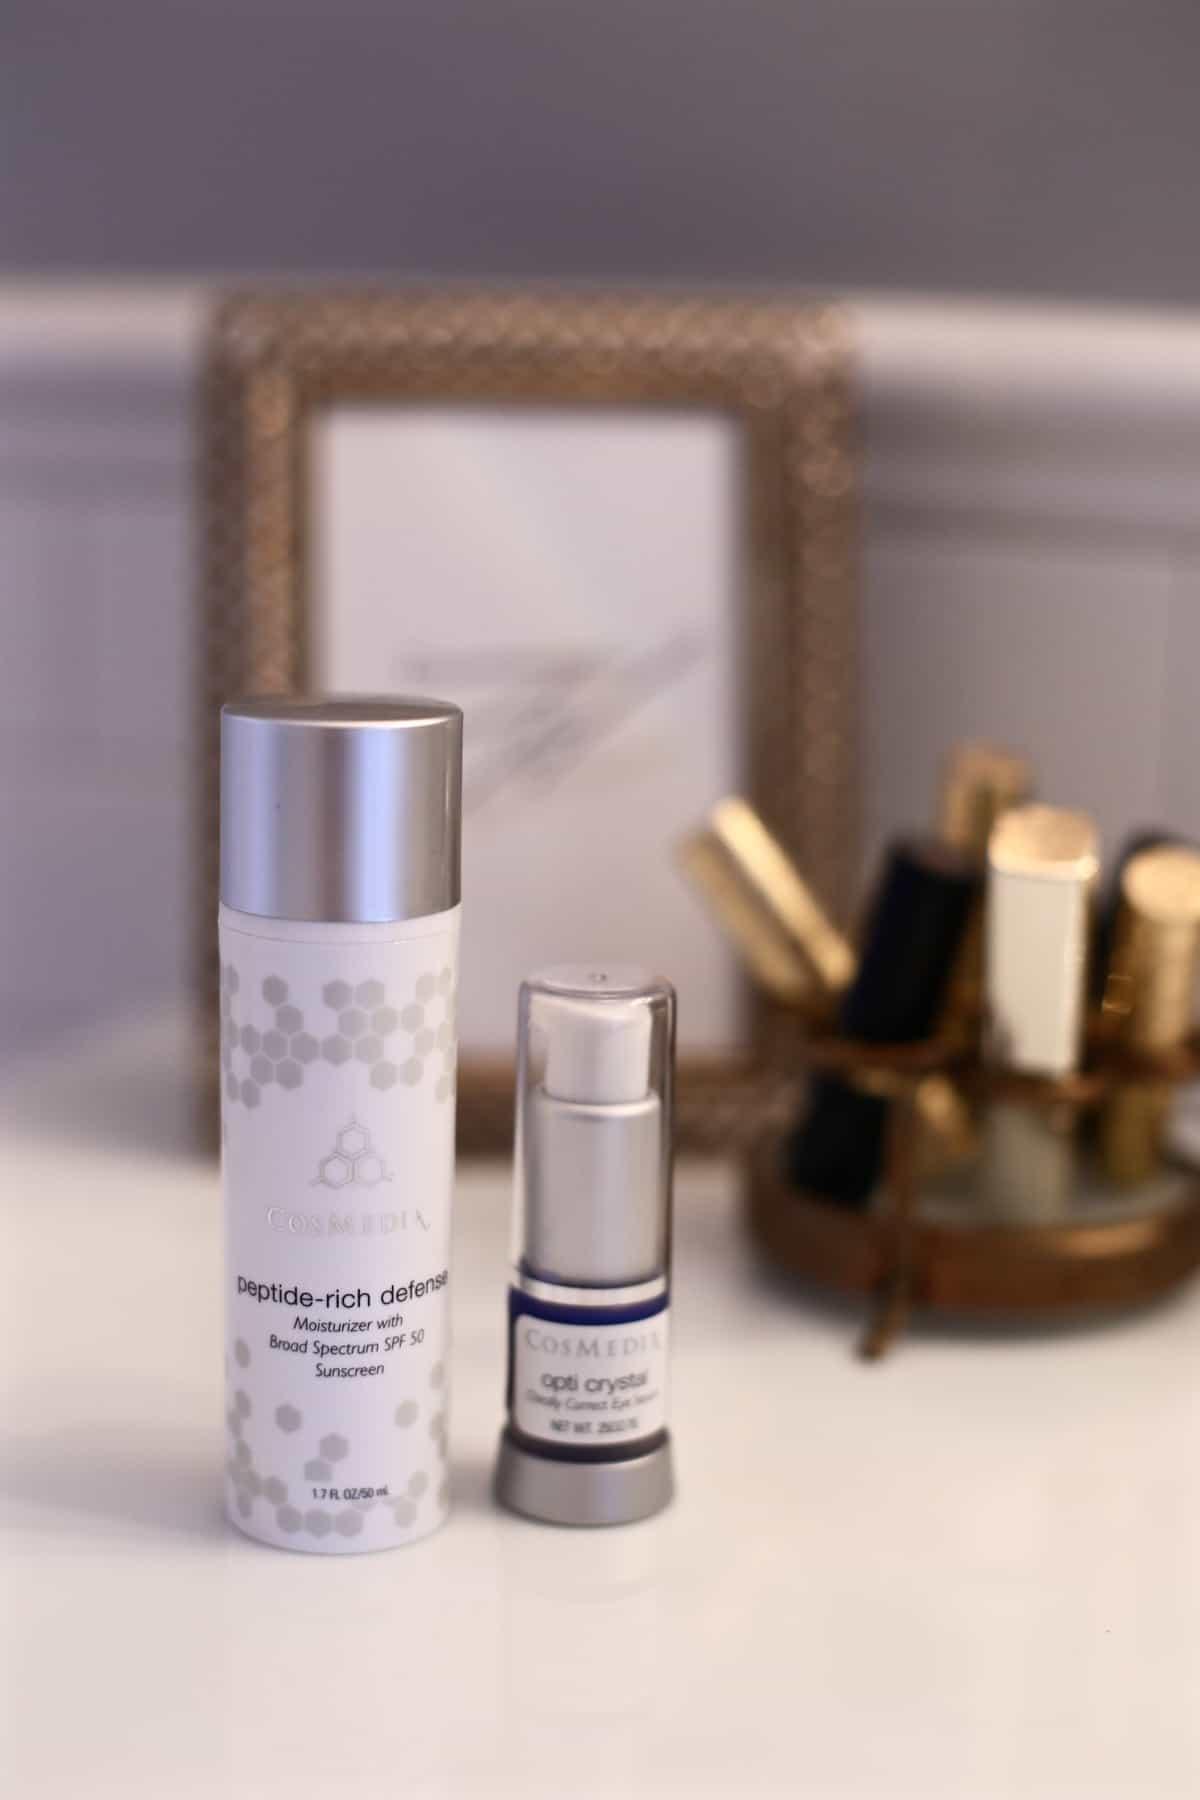 cosmedix skin care products via @mystylevita